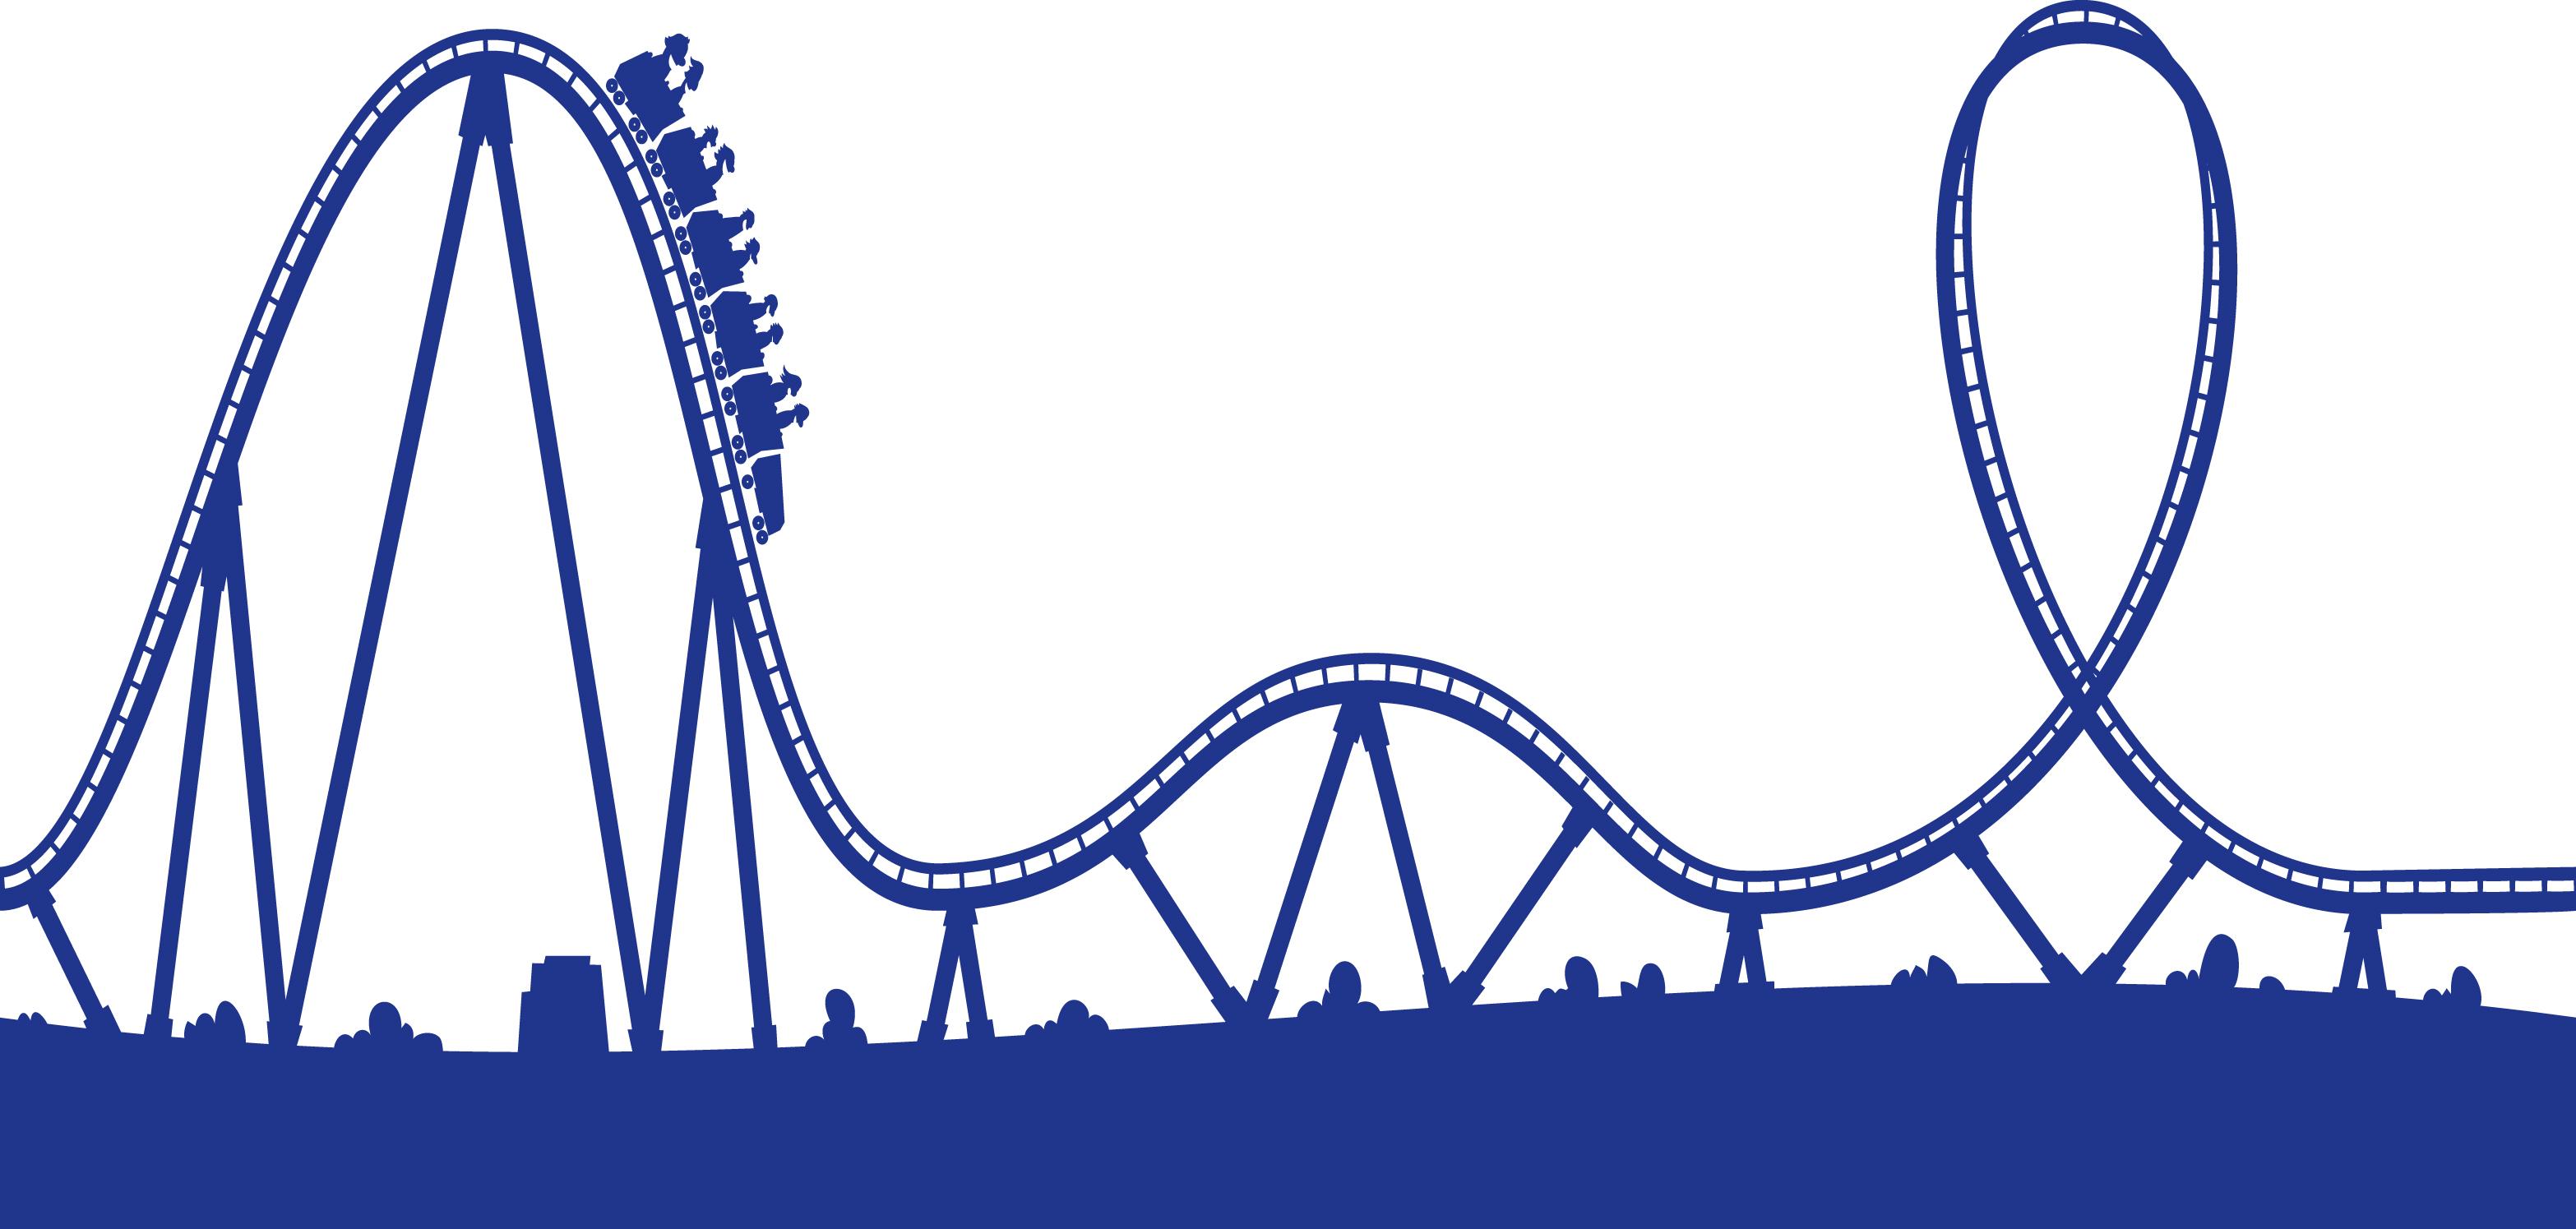 Roller Coaster Clipart.